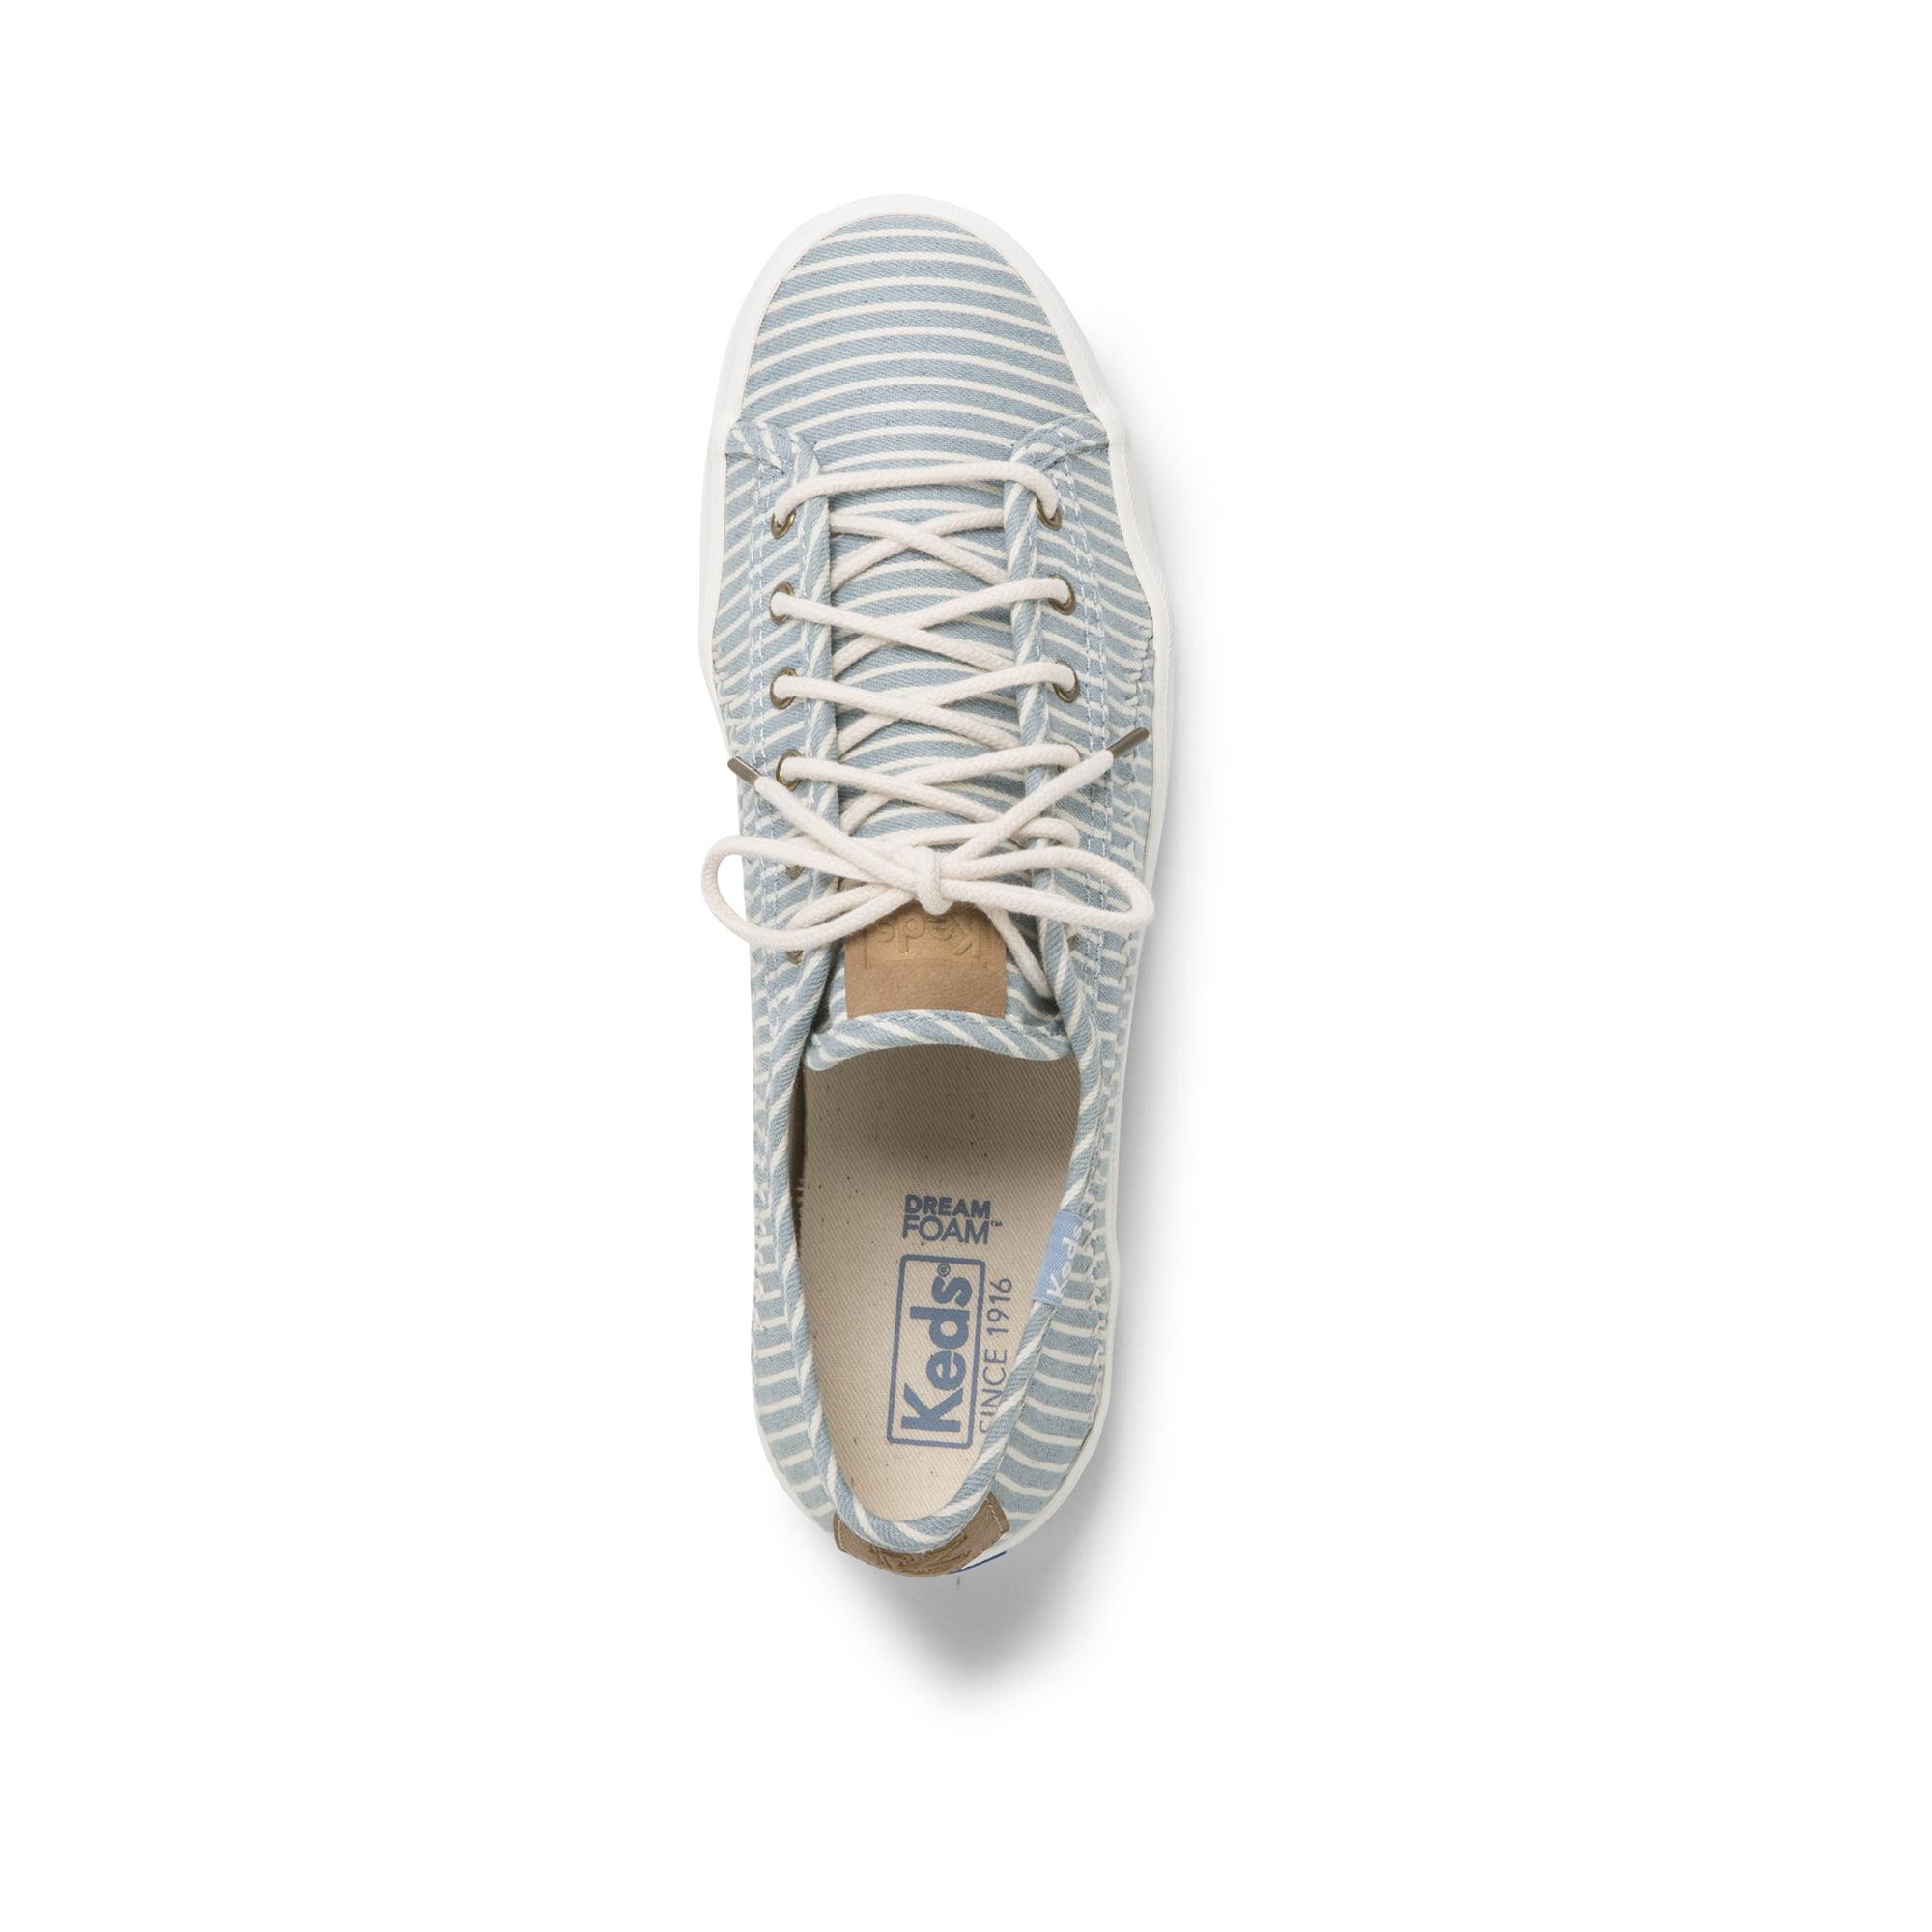 Keds Women's Kickstart Pennant Sneakers